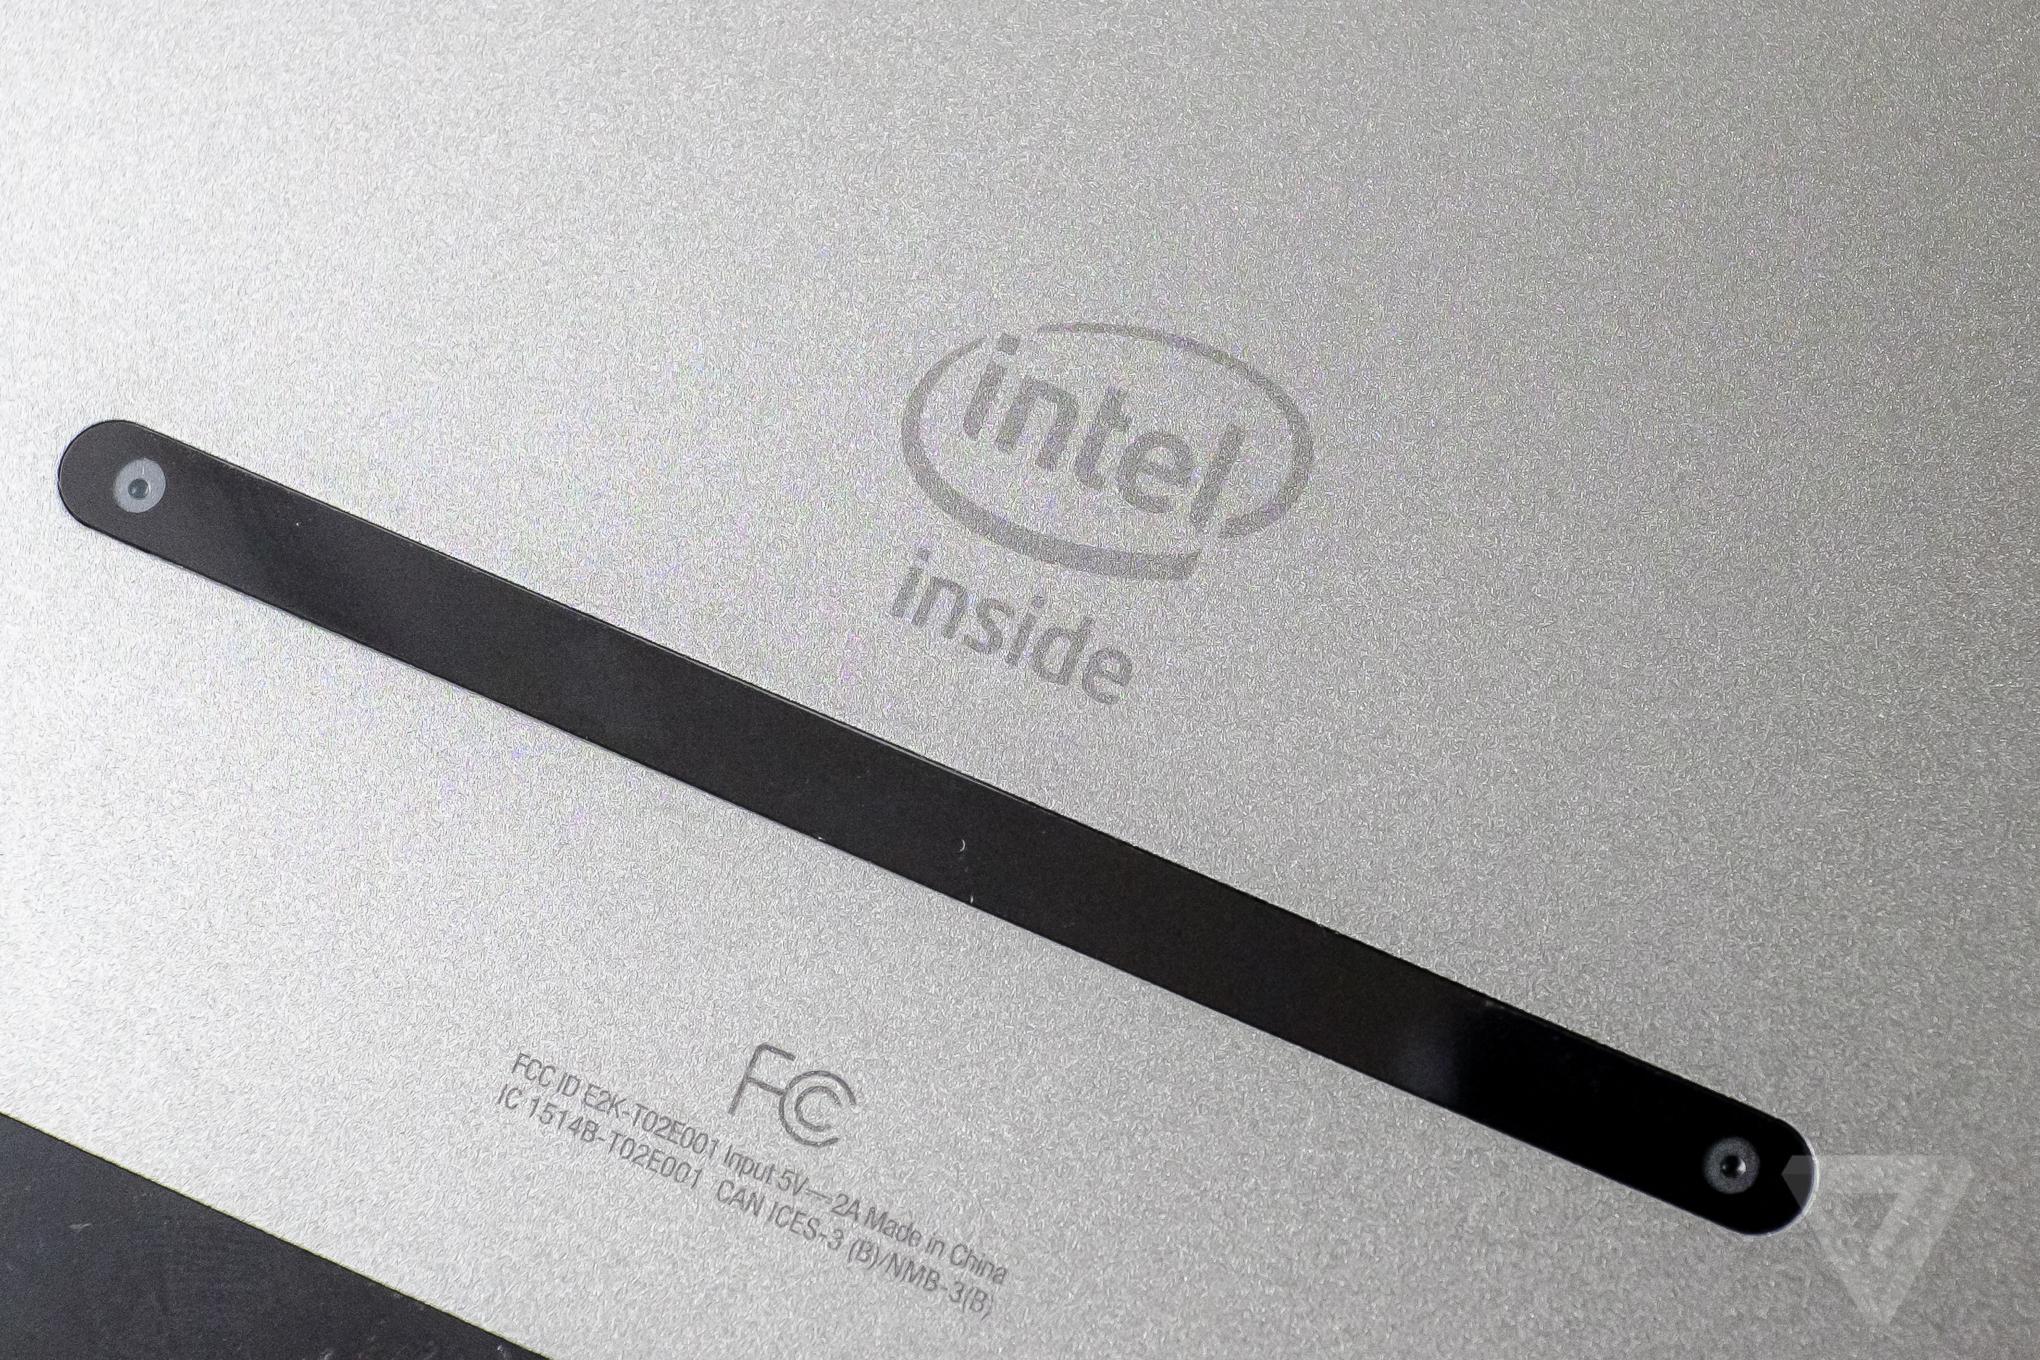 Dell's super thin, aluminum Venue 8 7000 is a surprisingly ...